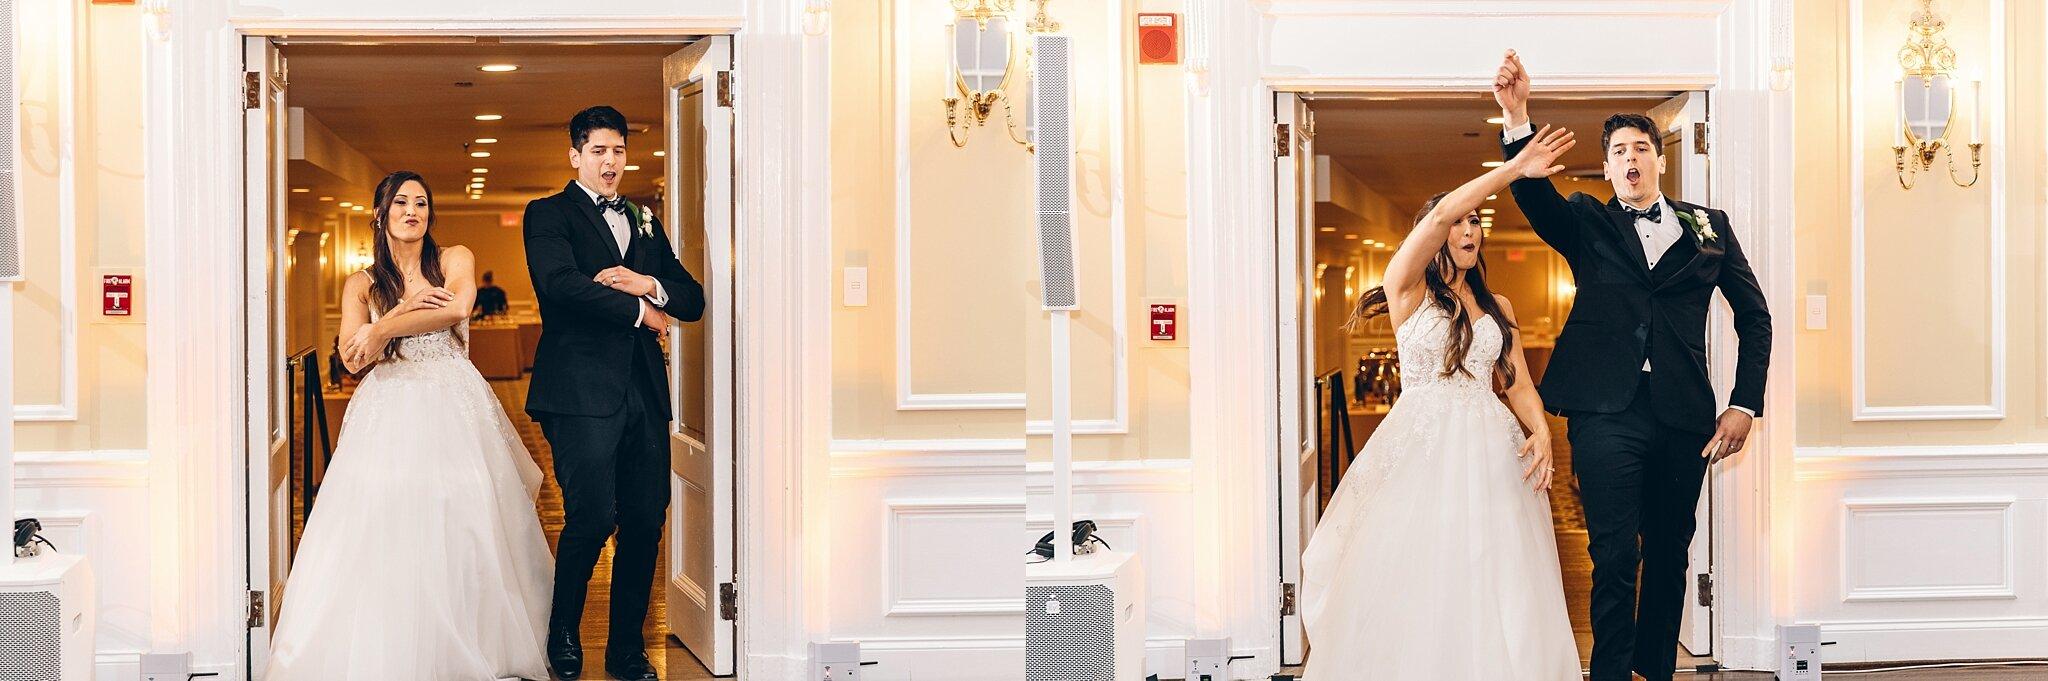 patrick-henry-ballroom-wedding-roanoke_0525.jpg